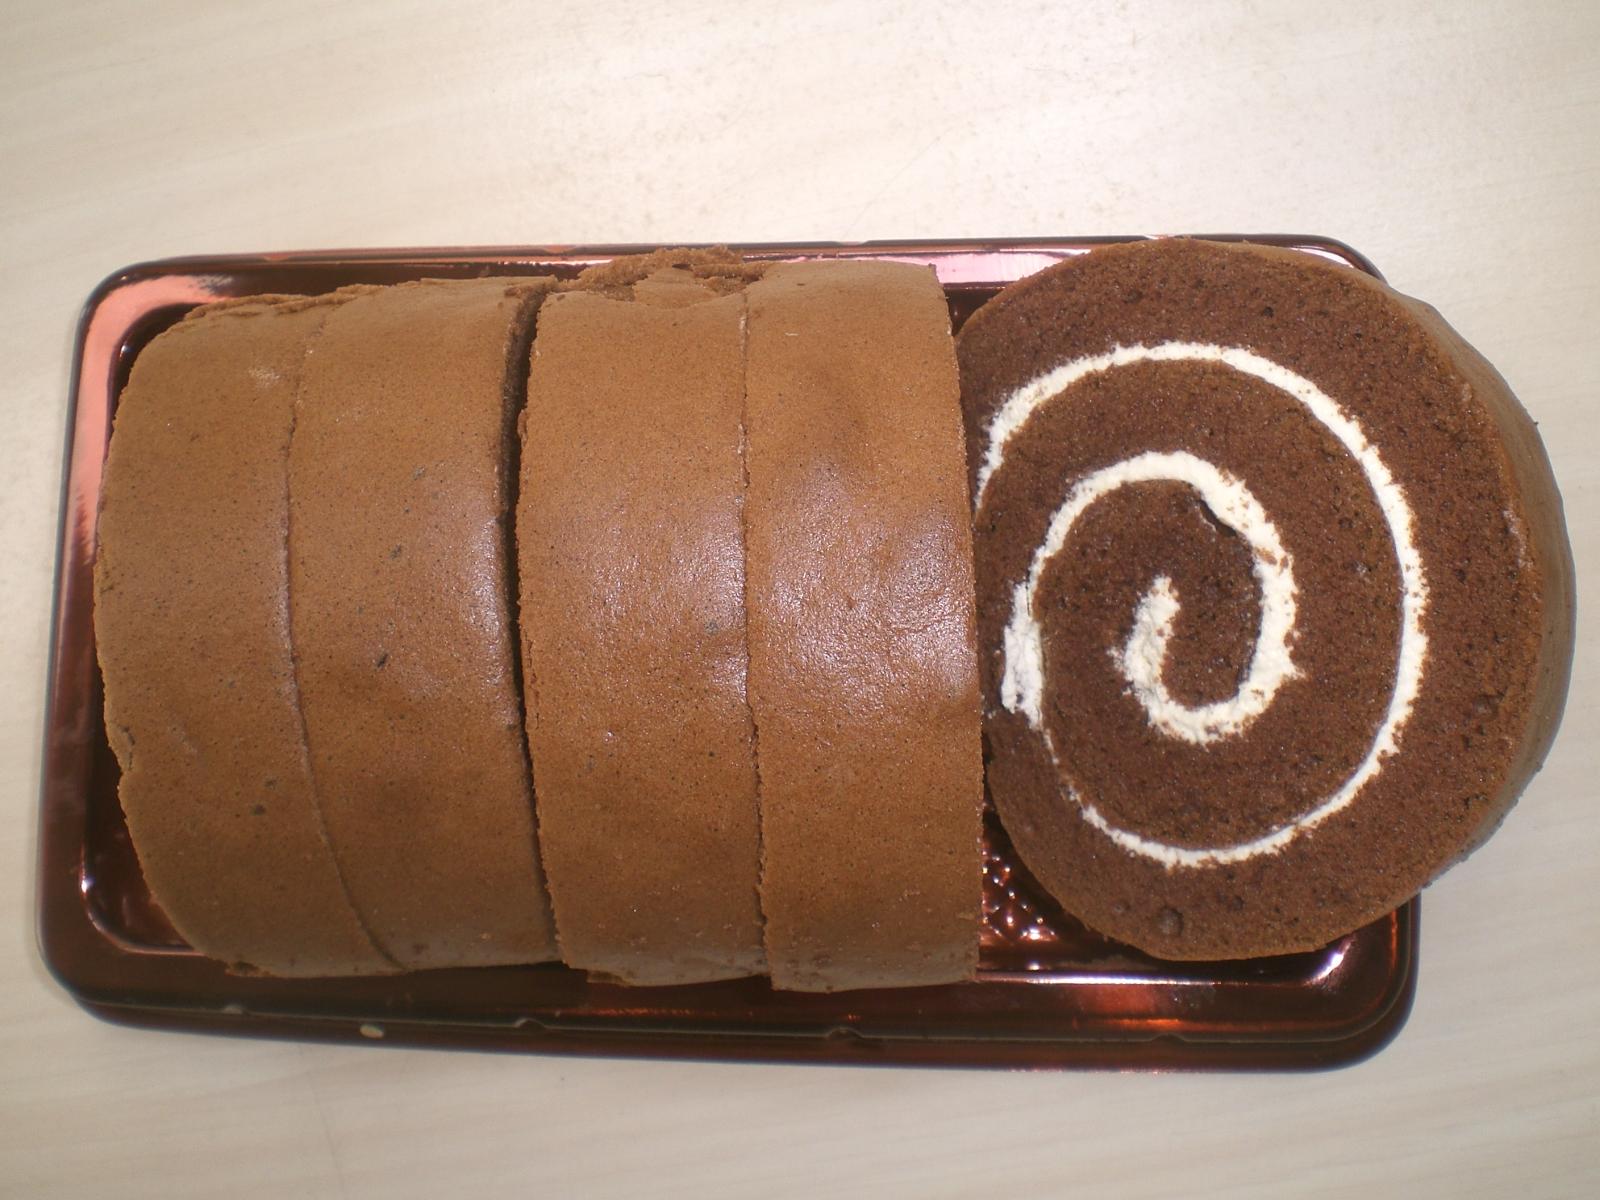 Chocolate Rolls Recipe Yeast